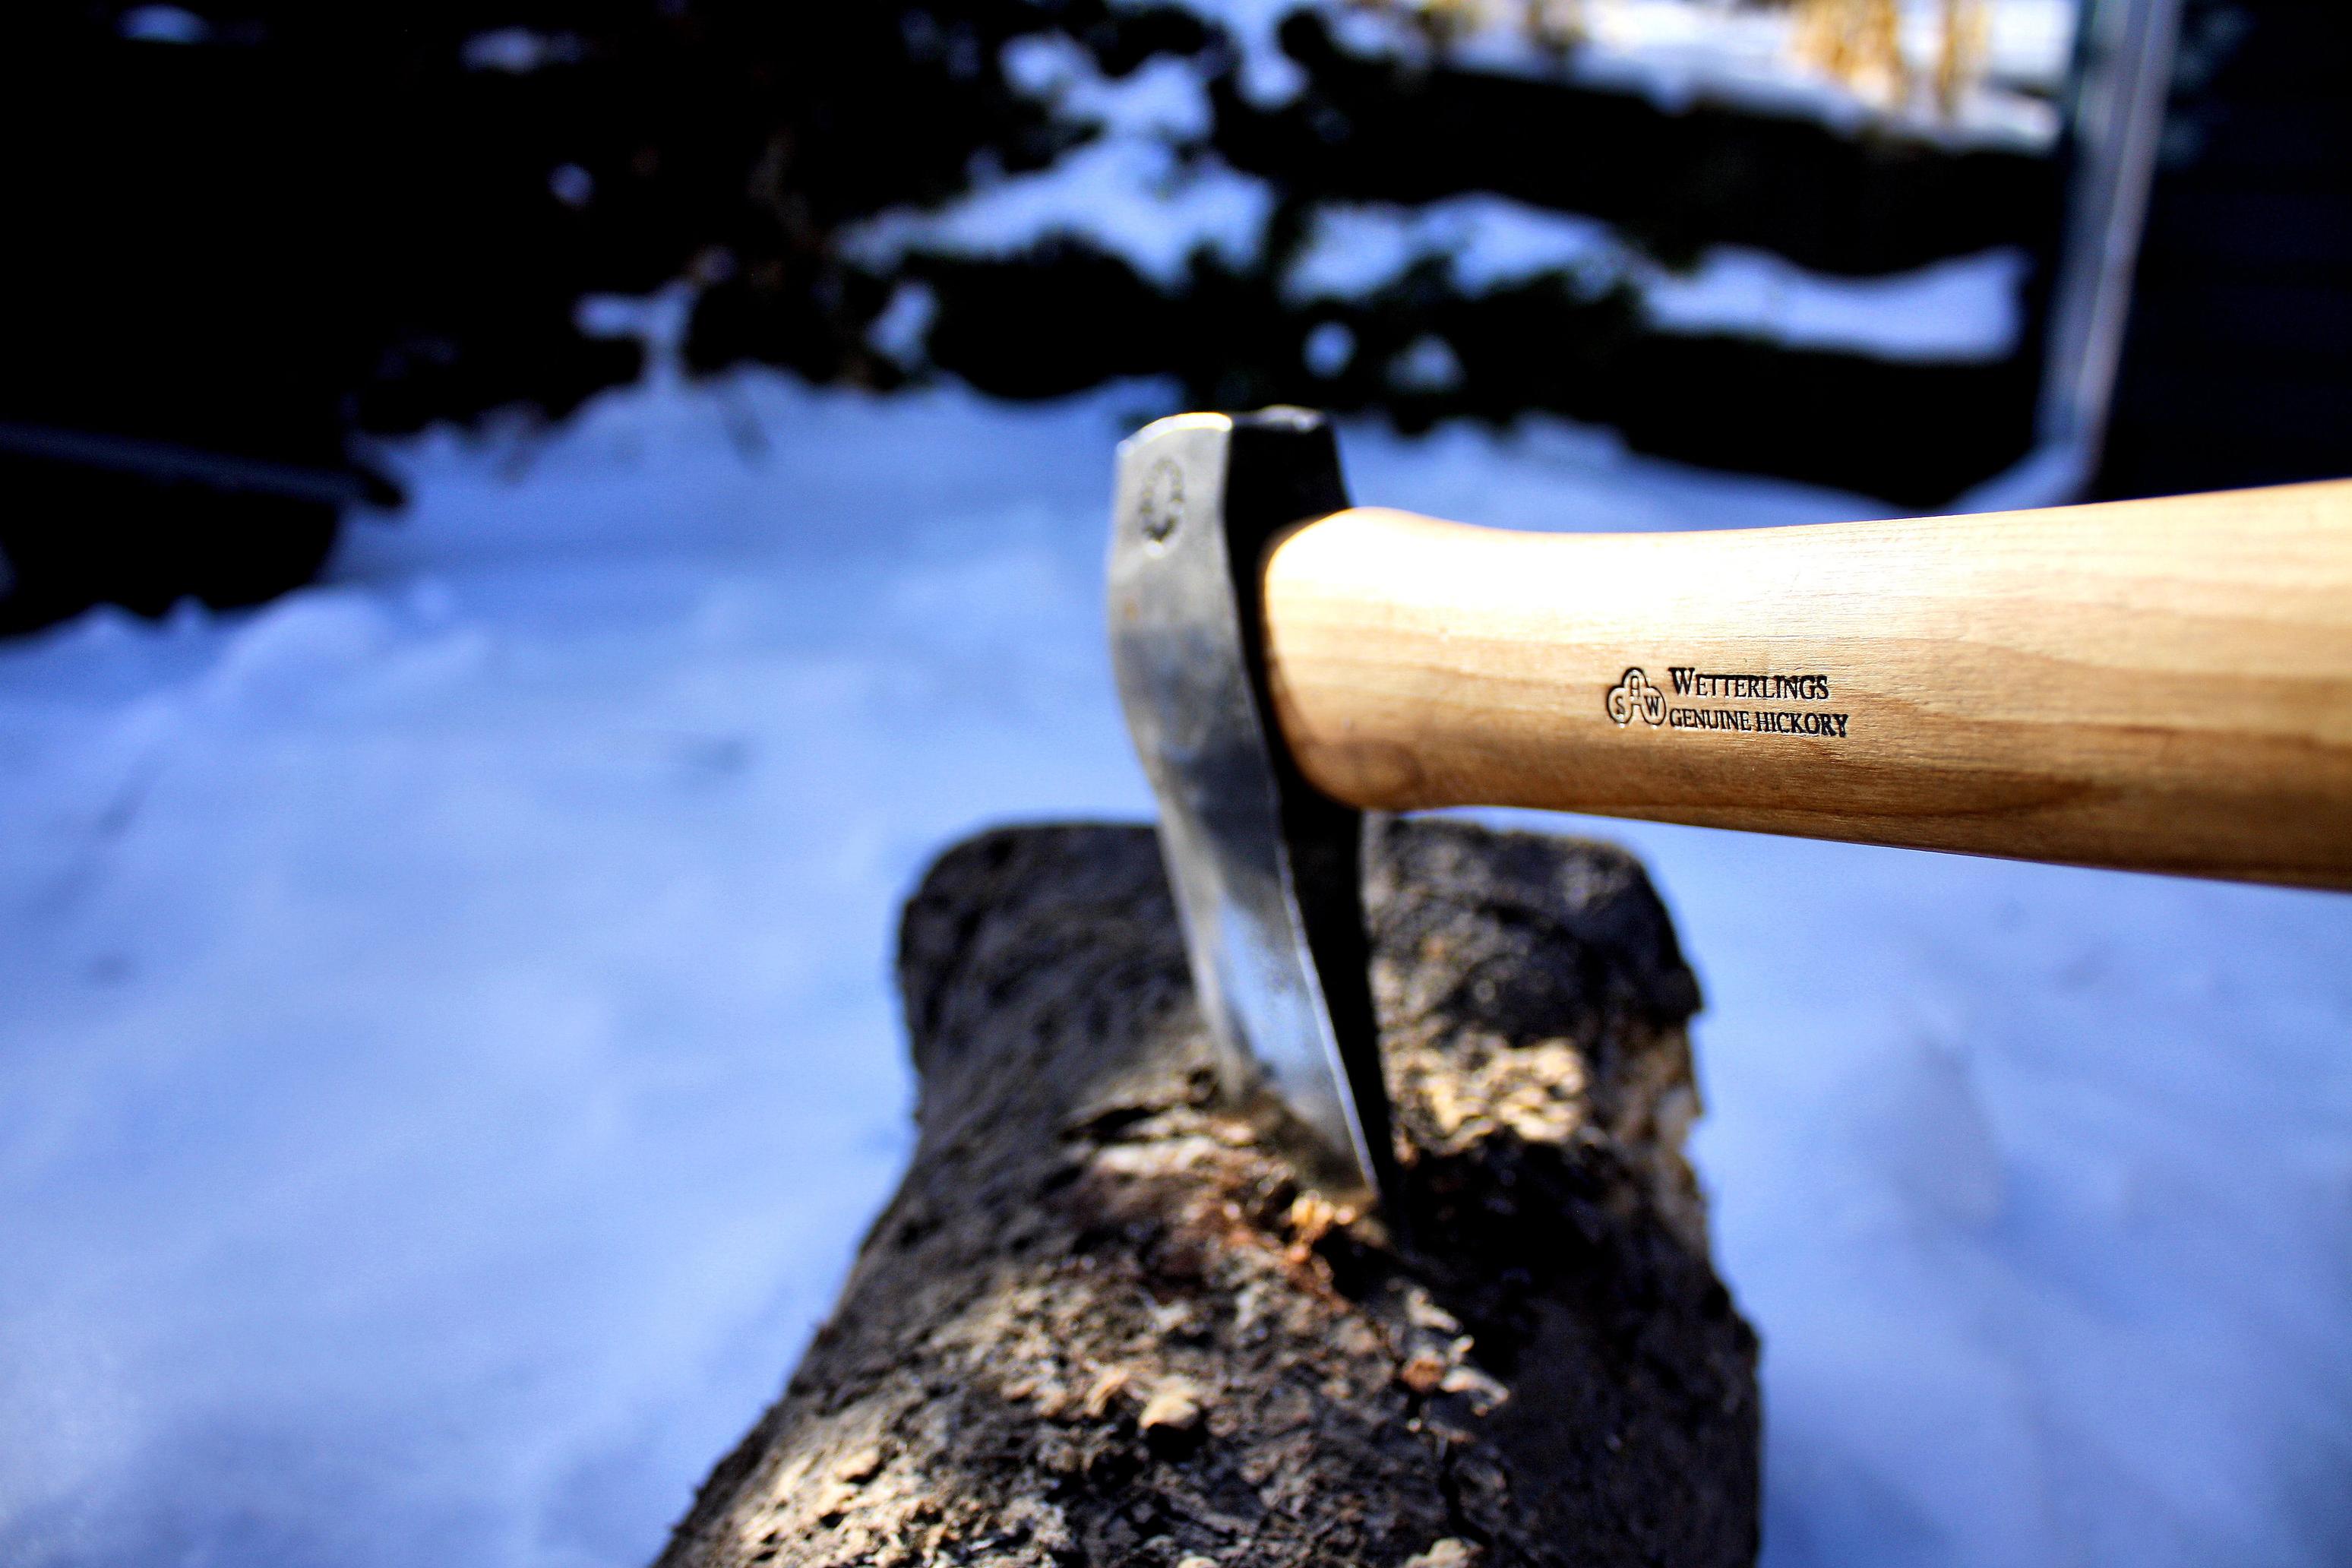 Axe chopping wood